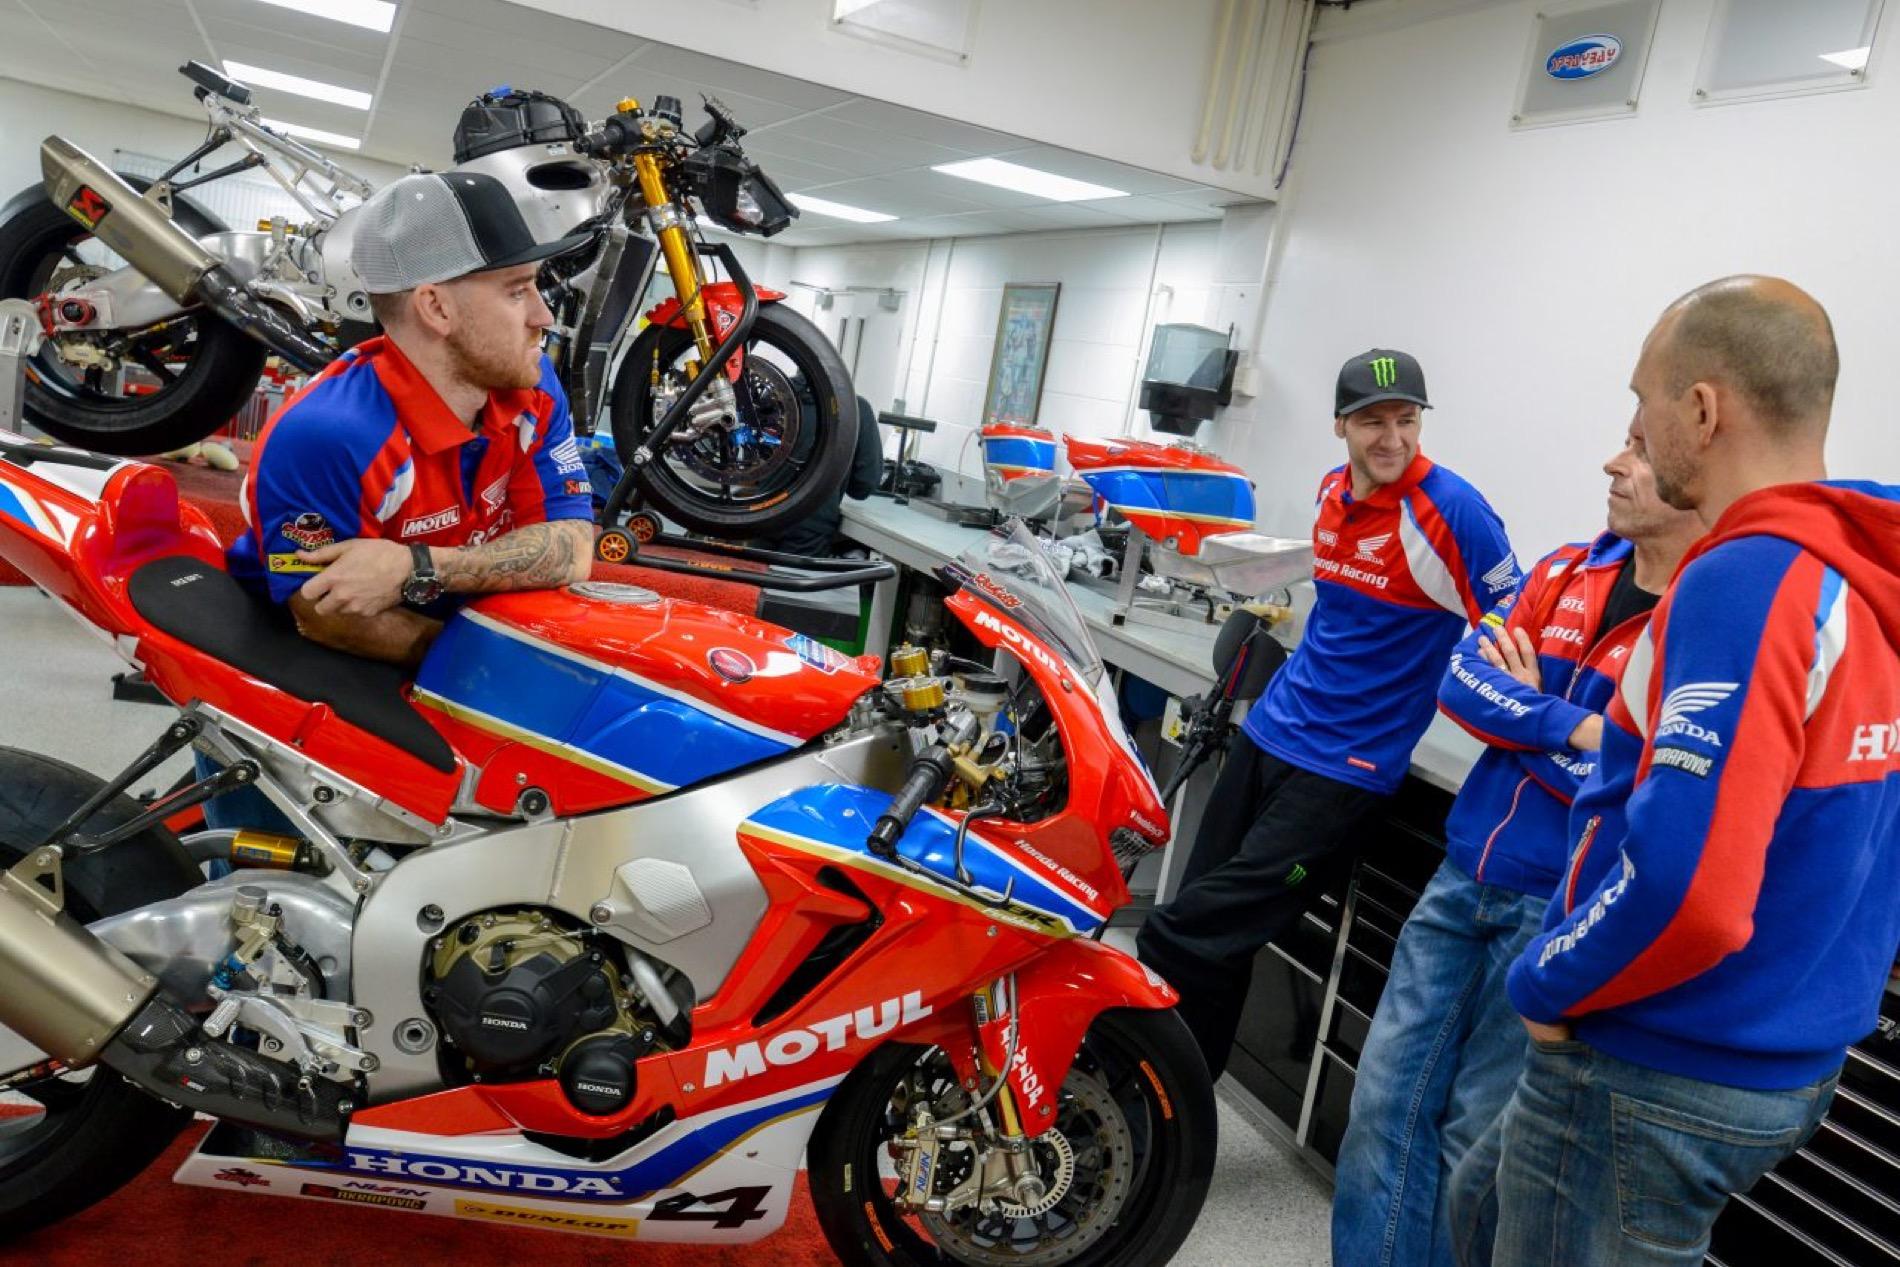 Equipo Honda Racing para Road Races